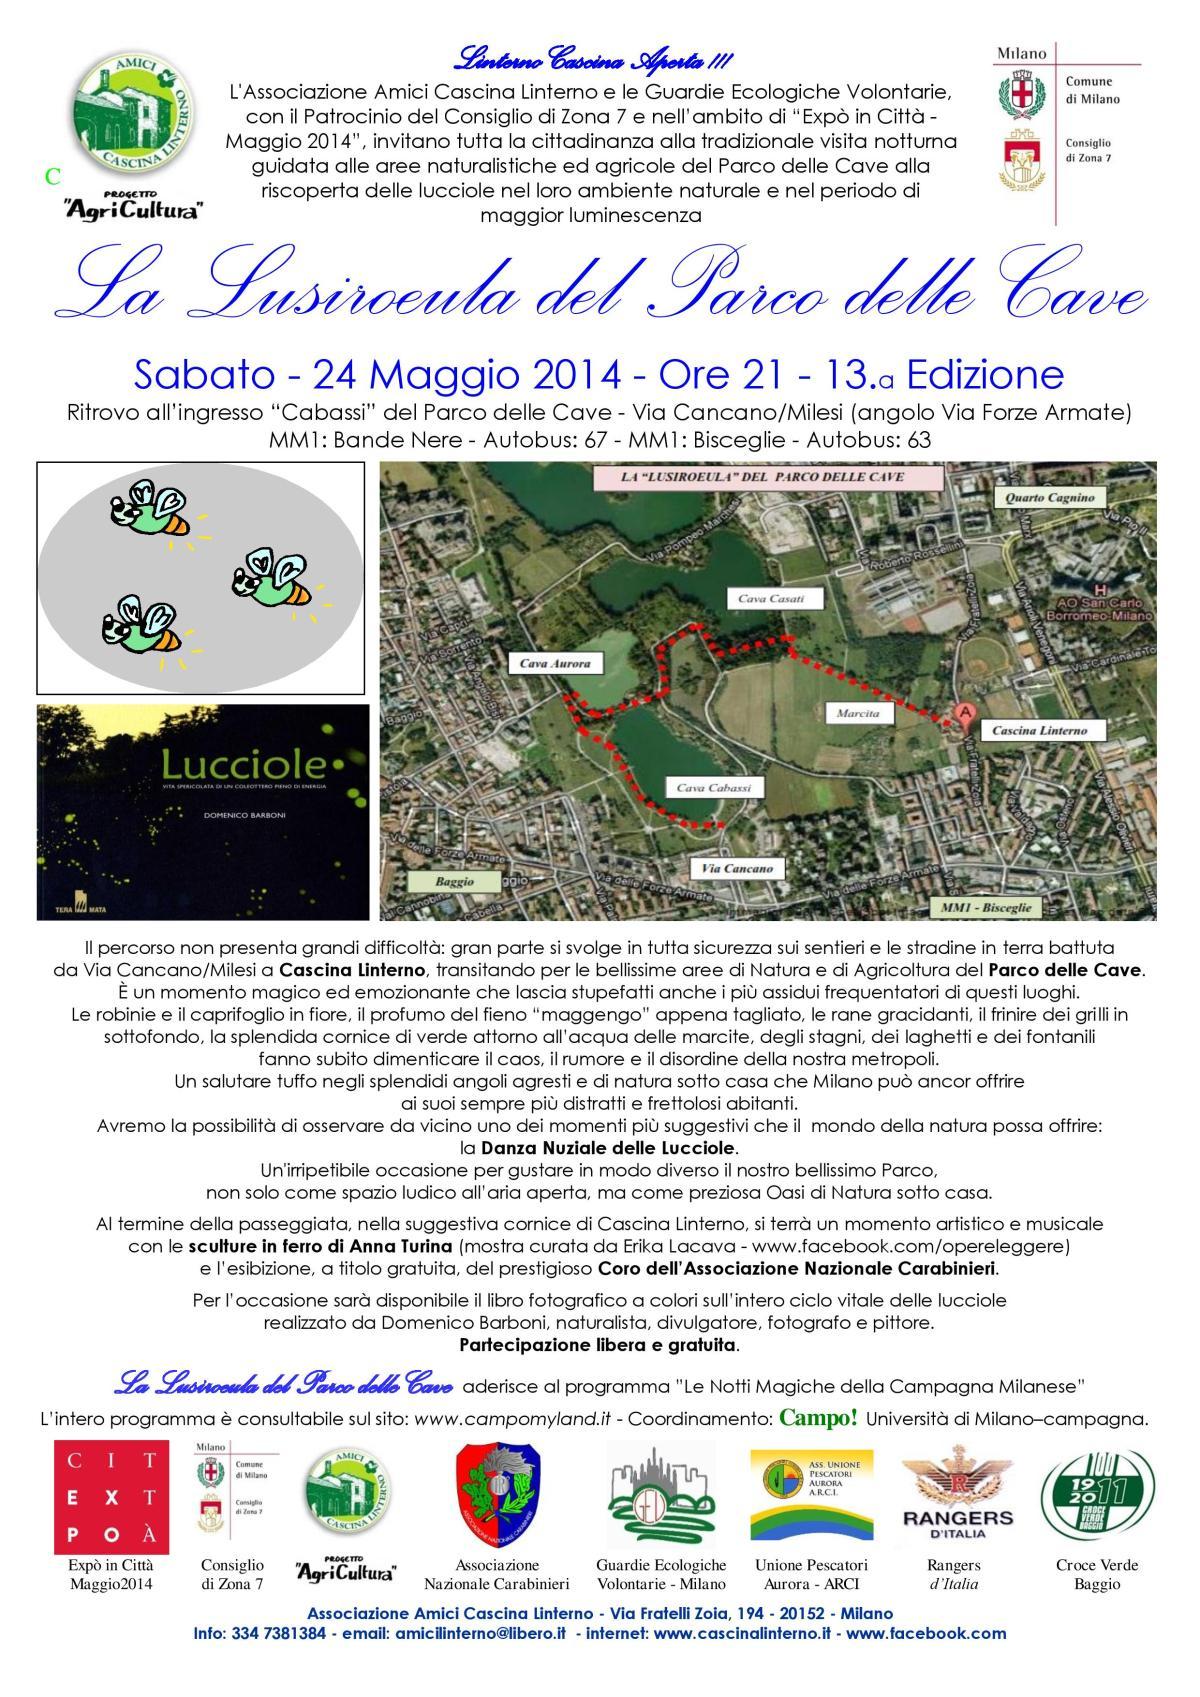 Lusiroeula2014_locandina_240514